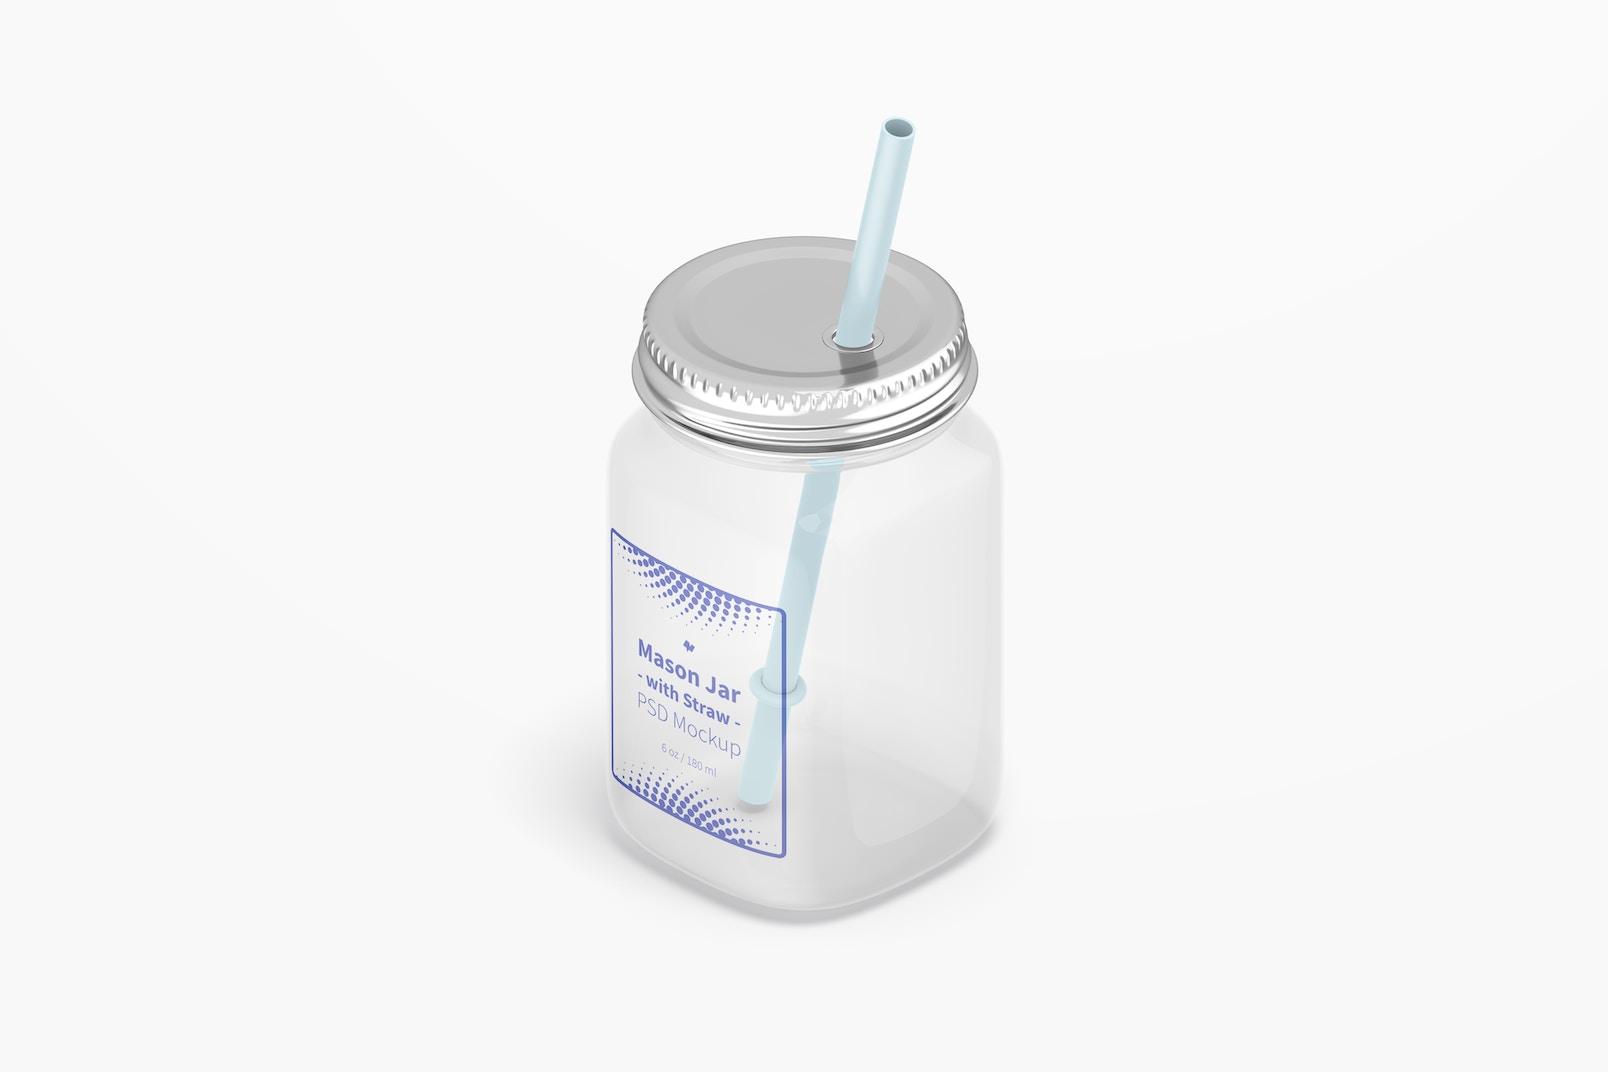 16 oz Mason Jar with Straw Mockup, Isometric Right View